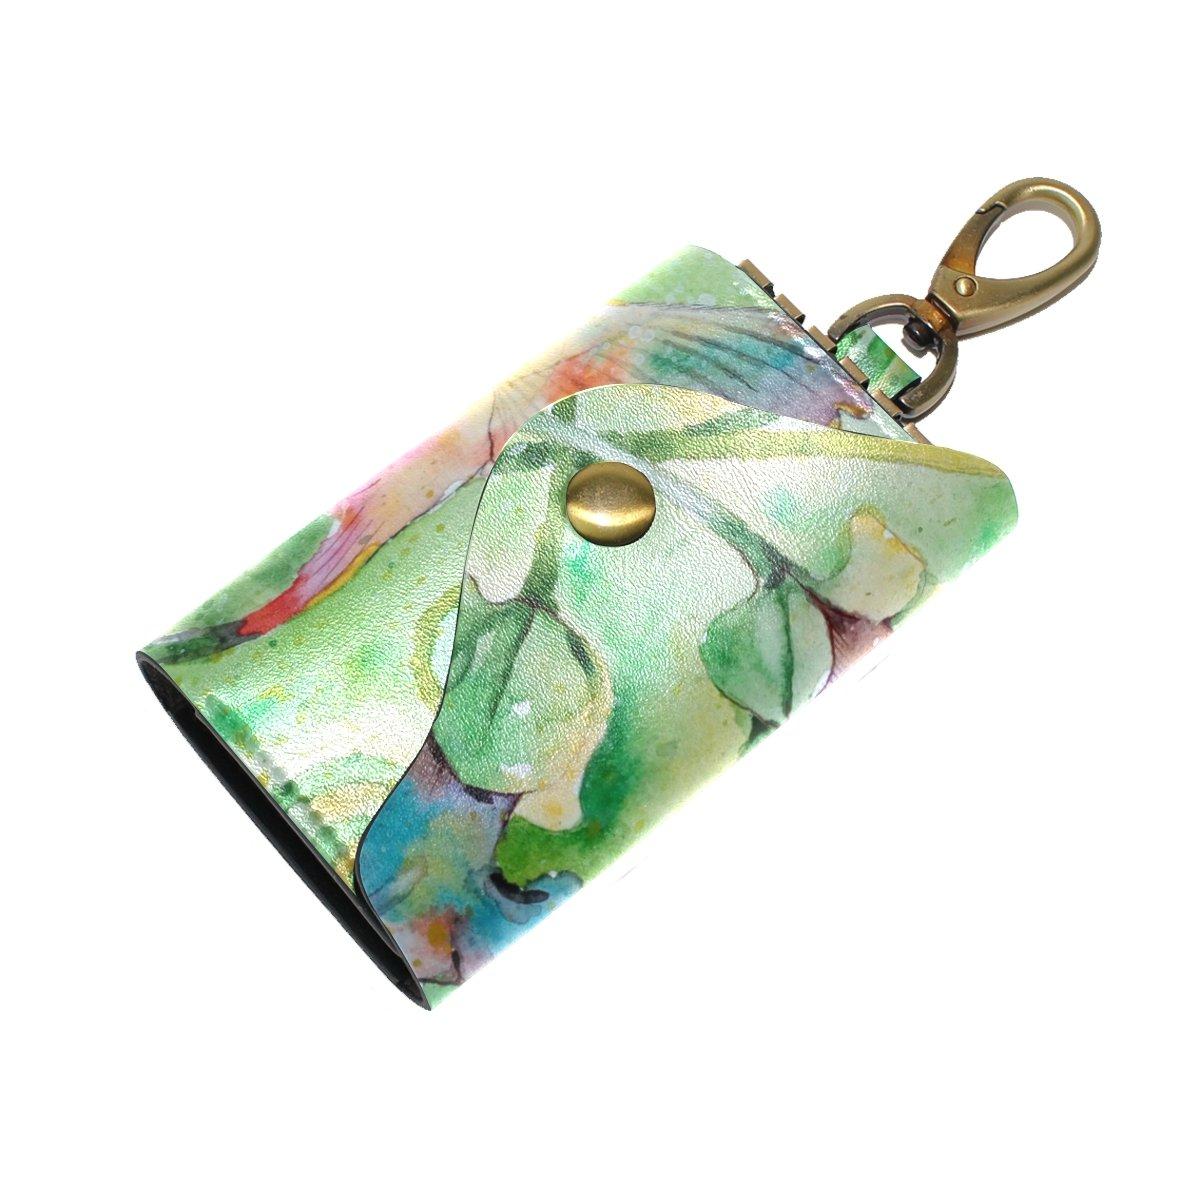 DEYYA Hummingbird Flowers Leather Key Case Wallets Unisex Keychain Key Holder with 6 Hooks Snap Closure